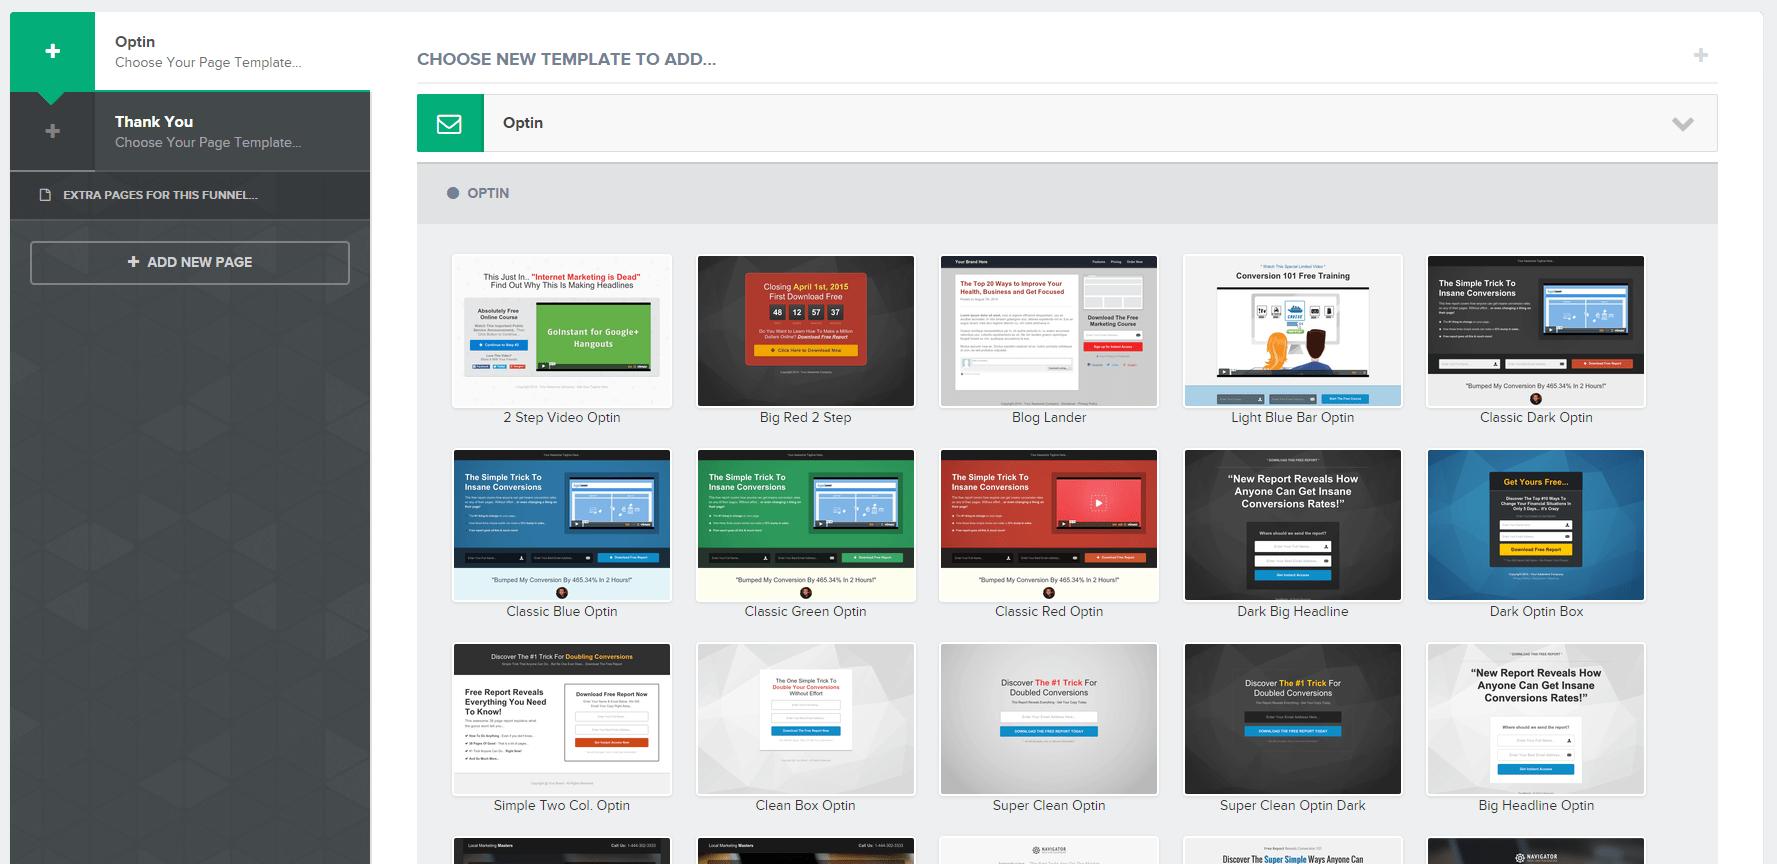 Optin email dei modelli ClickFunnels